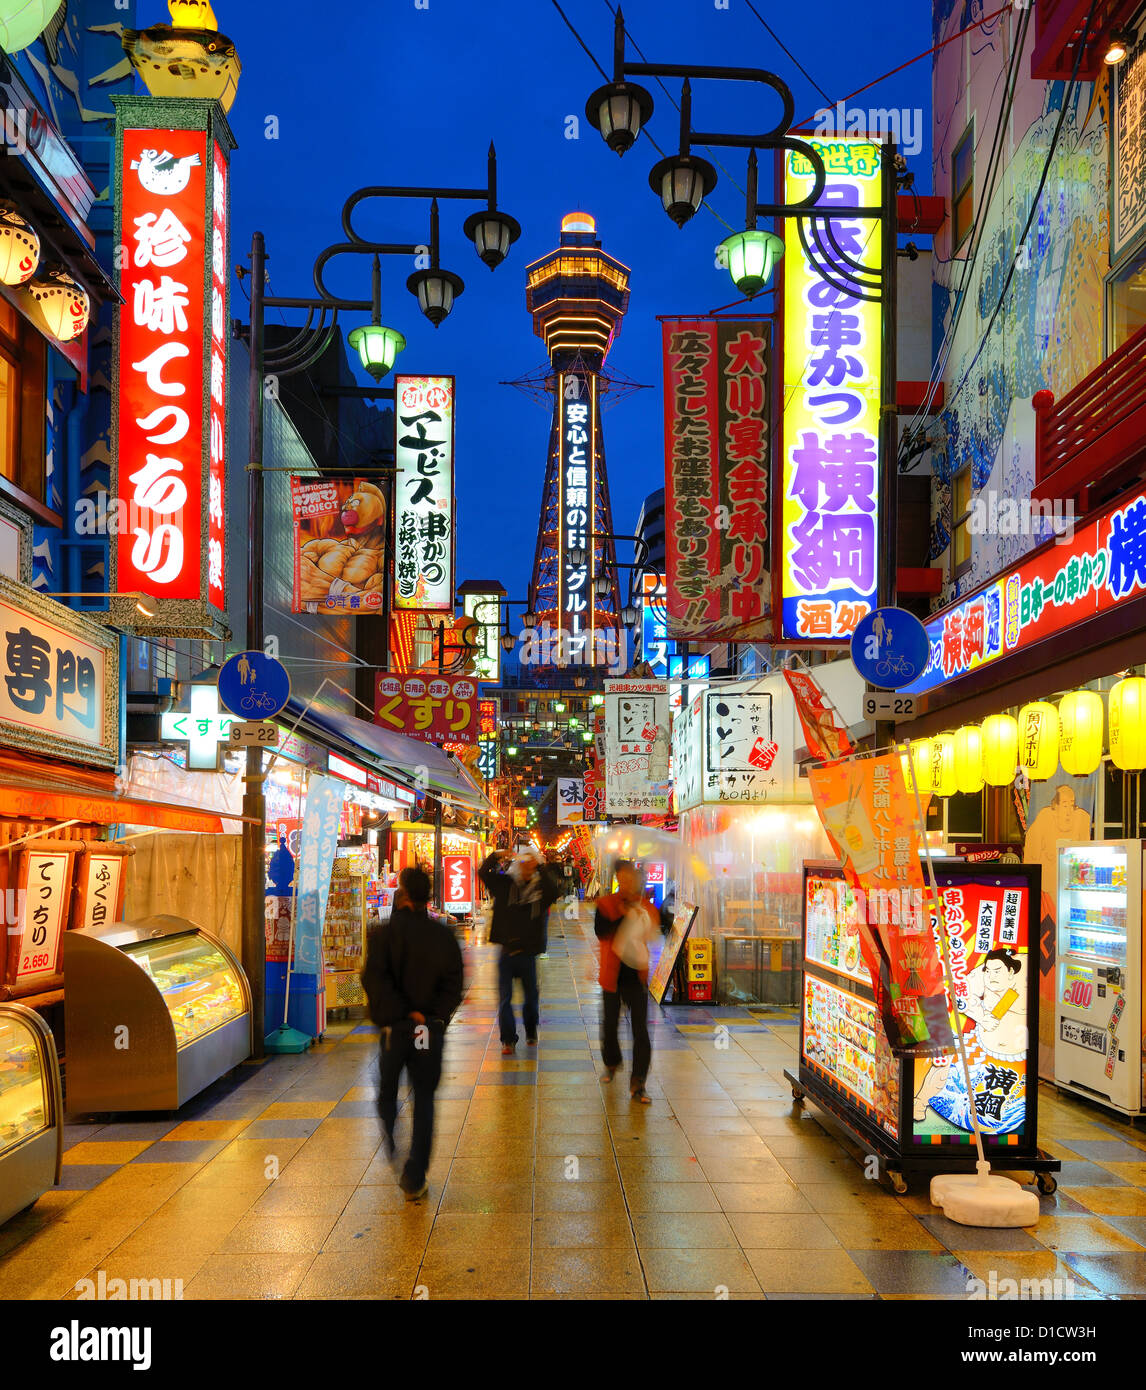 Shinsekai Vergnügungsviertel in Osaka, Japan. Stockbild